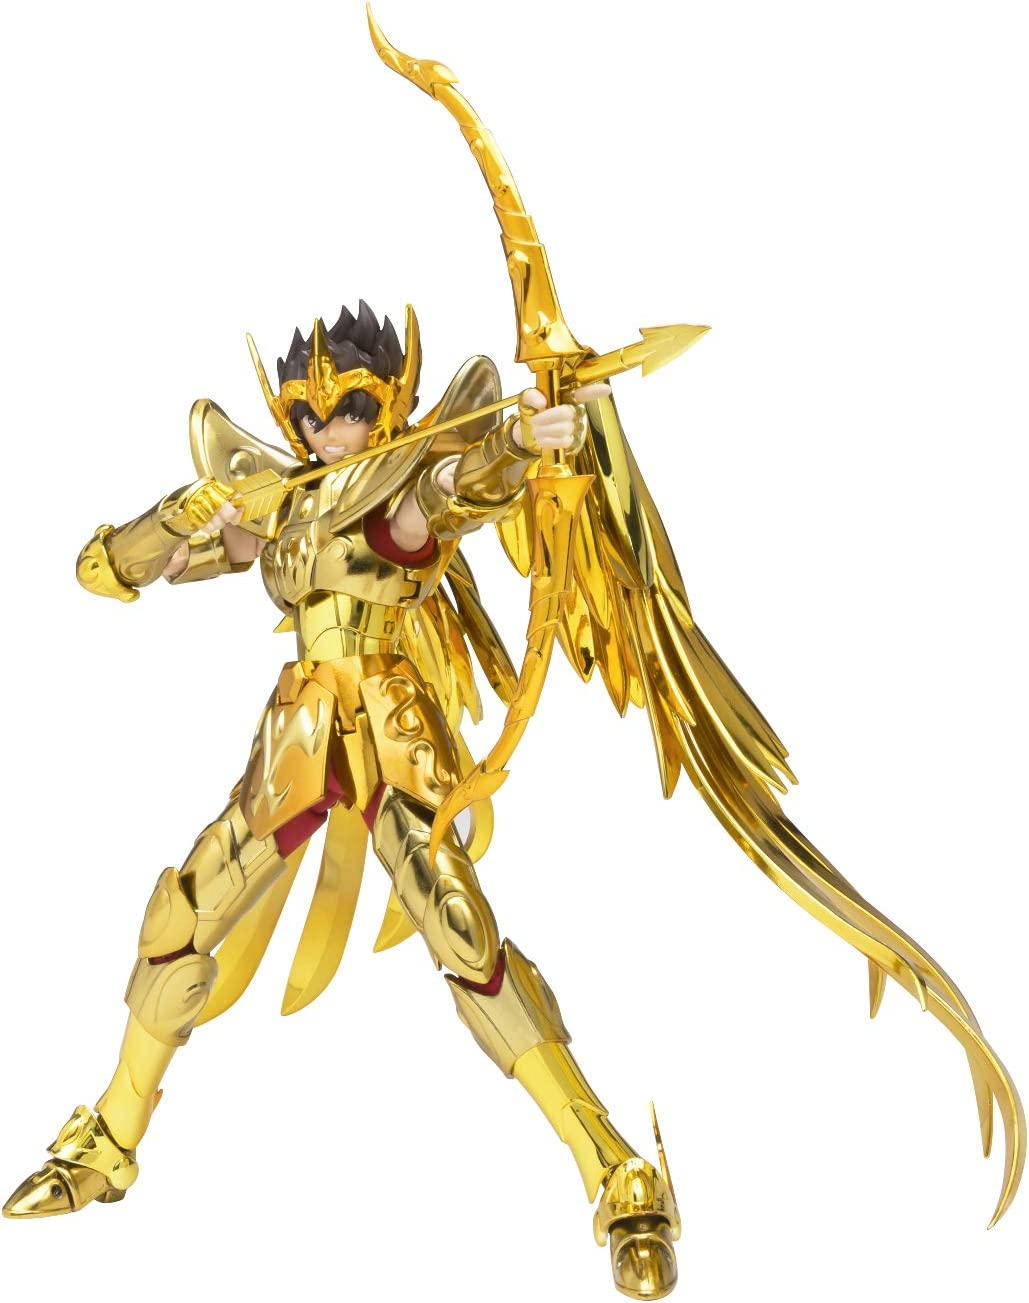 SOG Myth Cloth EX Soul of Gold Sagittaire Sagittarius Aiolos 18cm Bandai